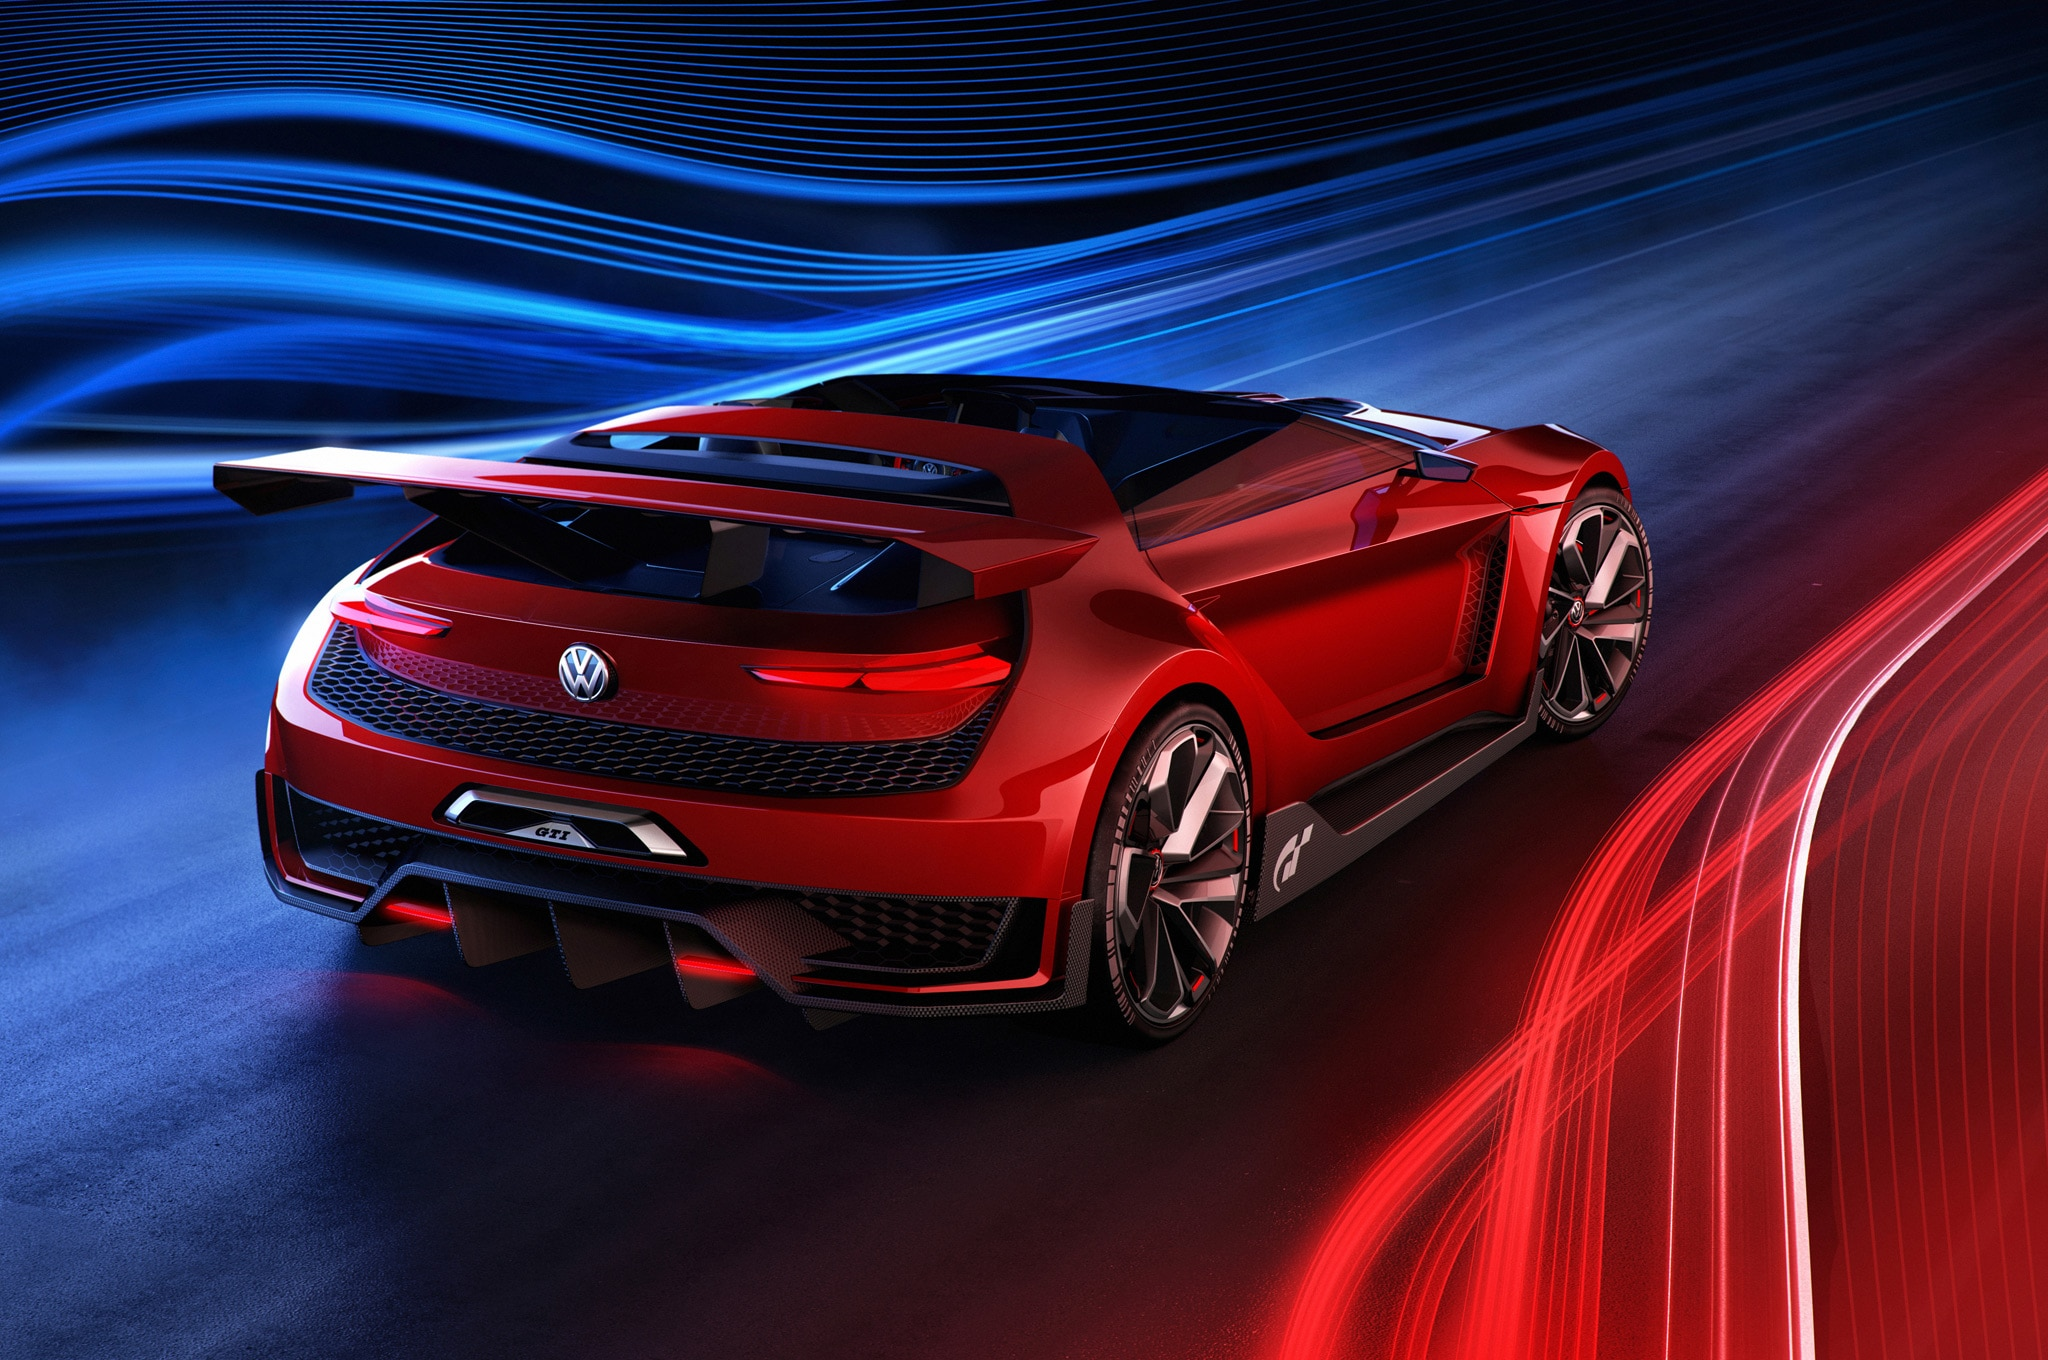 Volkswagen GTI Roadster Vision Gran Turismo Rear Side View1